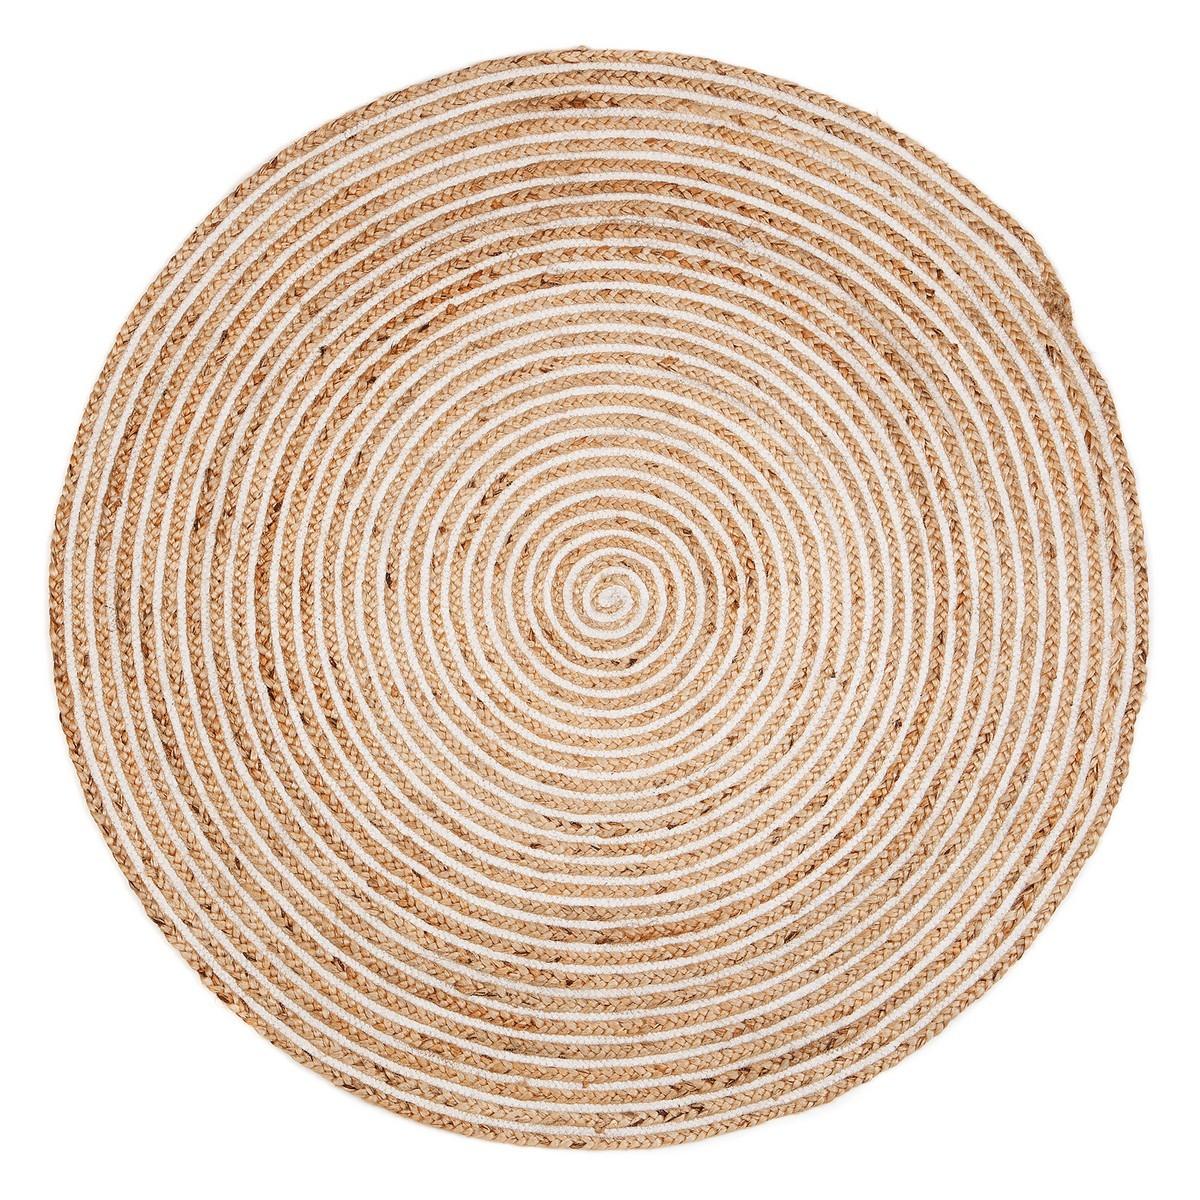 Plumeria Hand Braided Jute Round Rug, 120cm